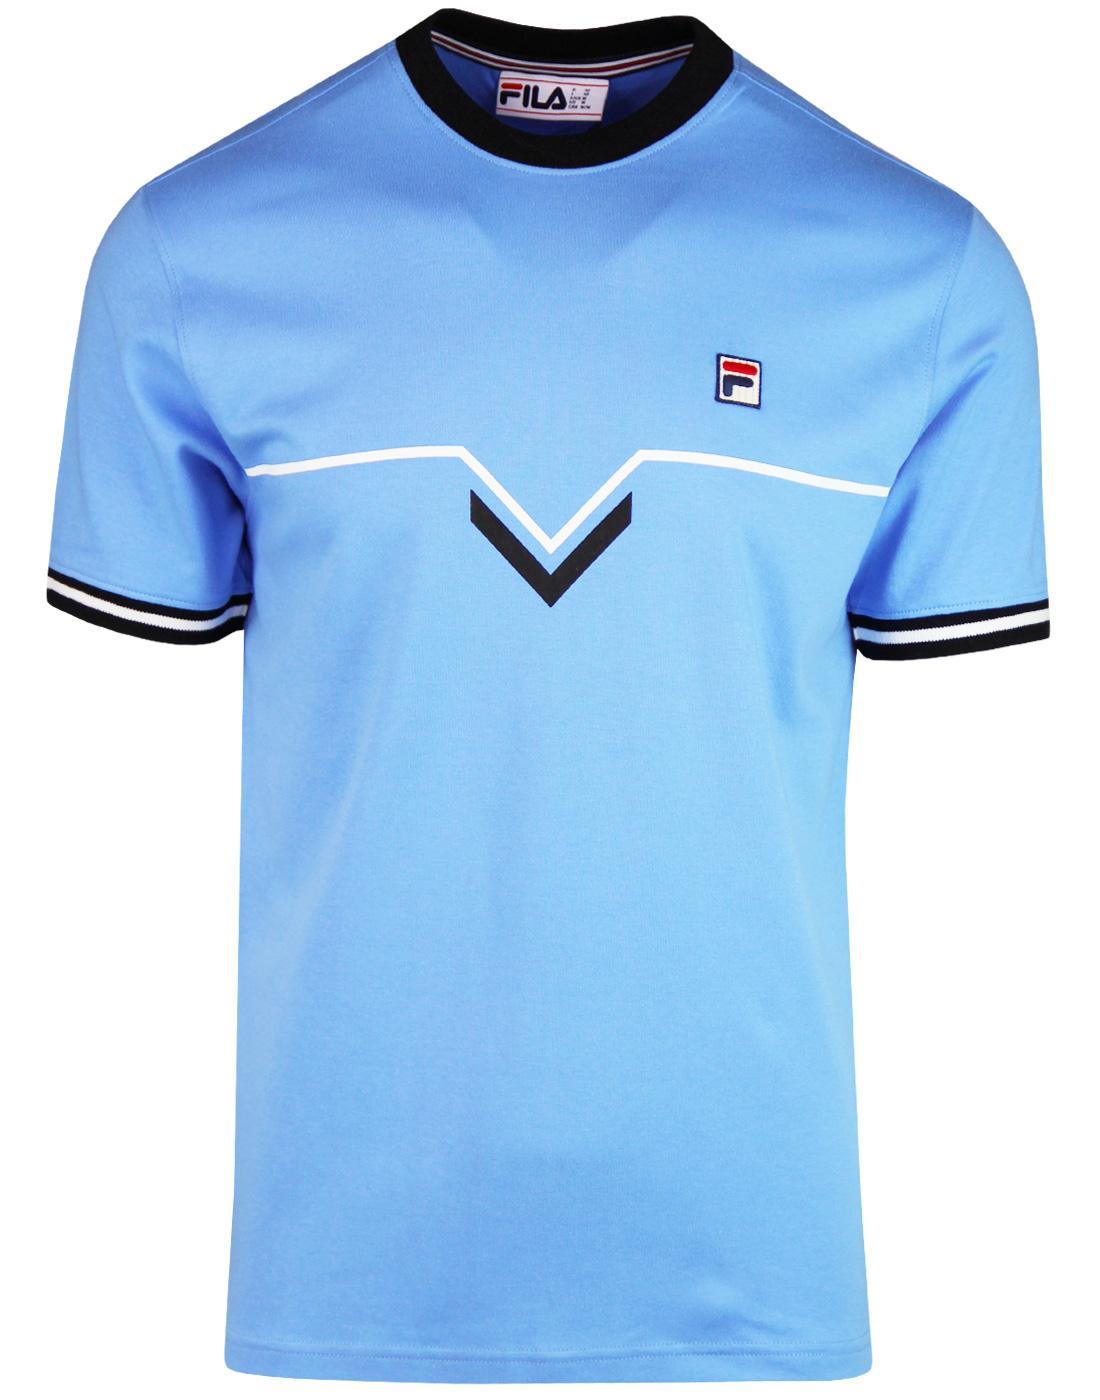 Leandro FILA VINTAGE Retro Chevron Stripe T-Shirt